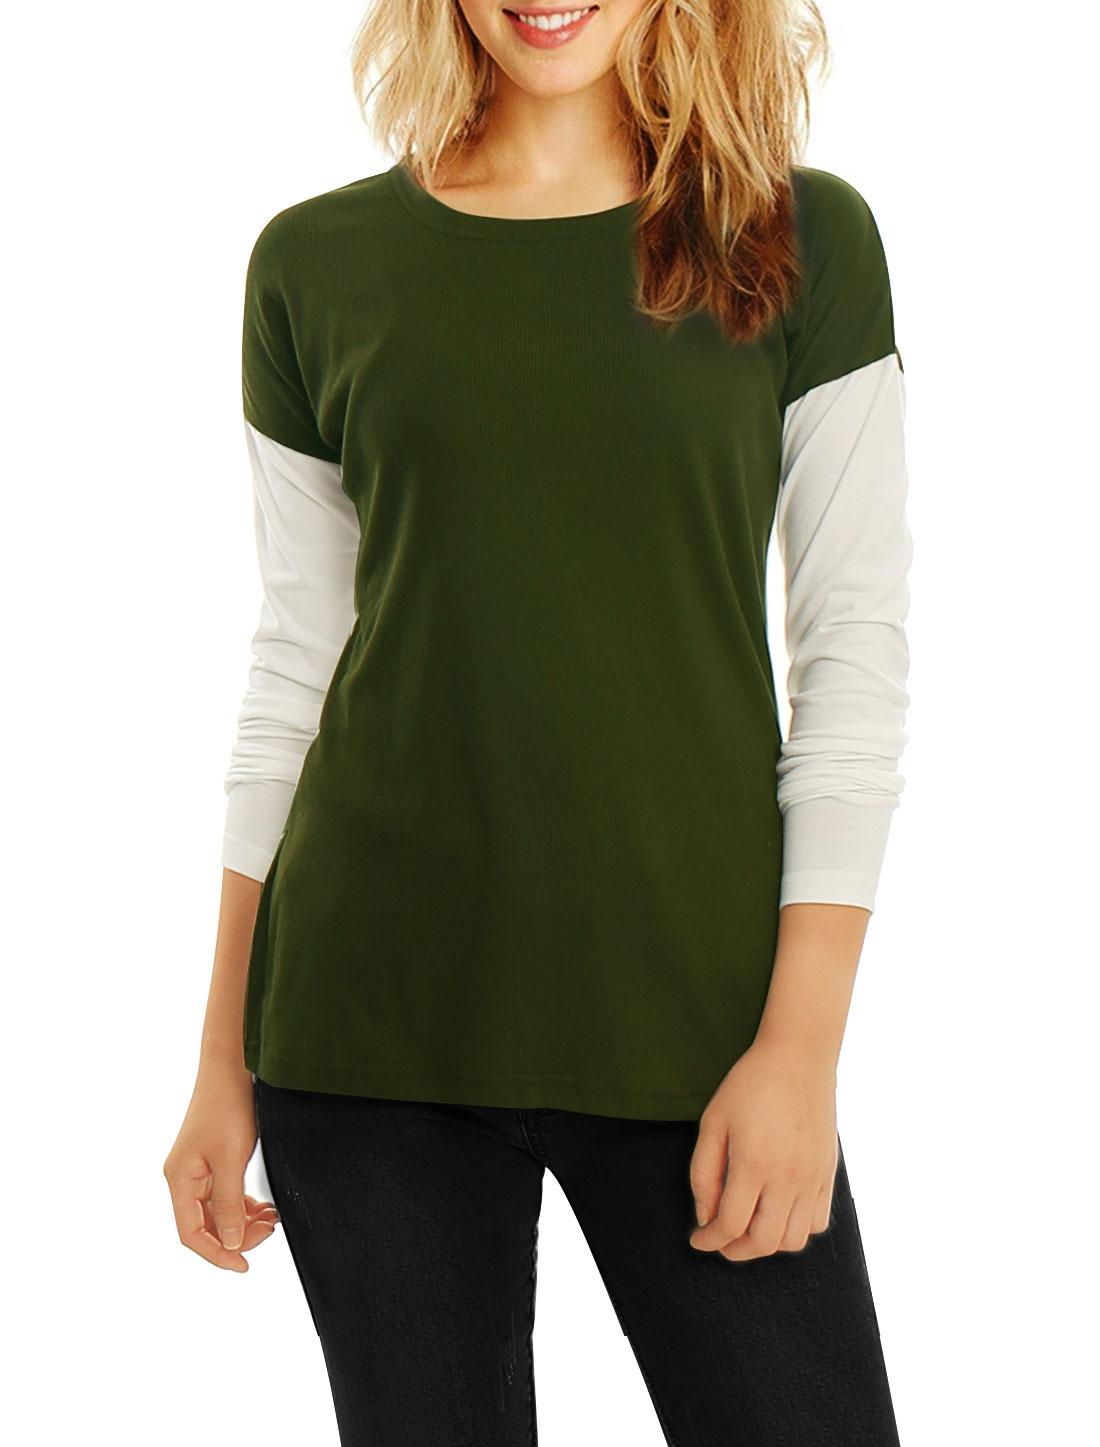 Women Color Block Side-Slit Paneled Slim Fit Ribbed Top Green S